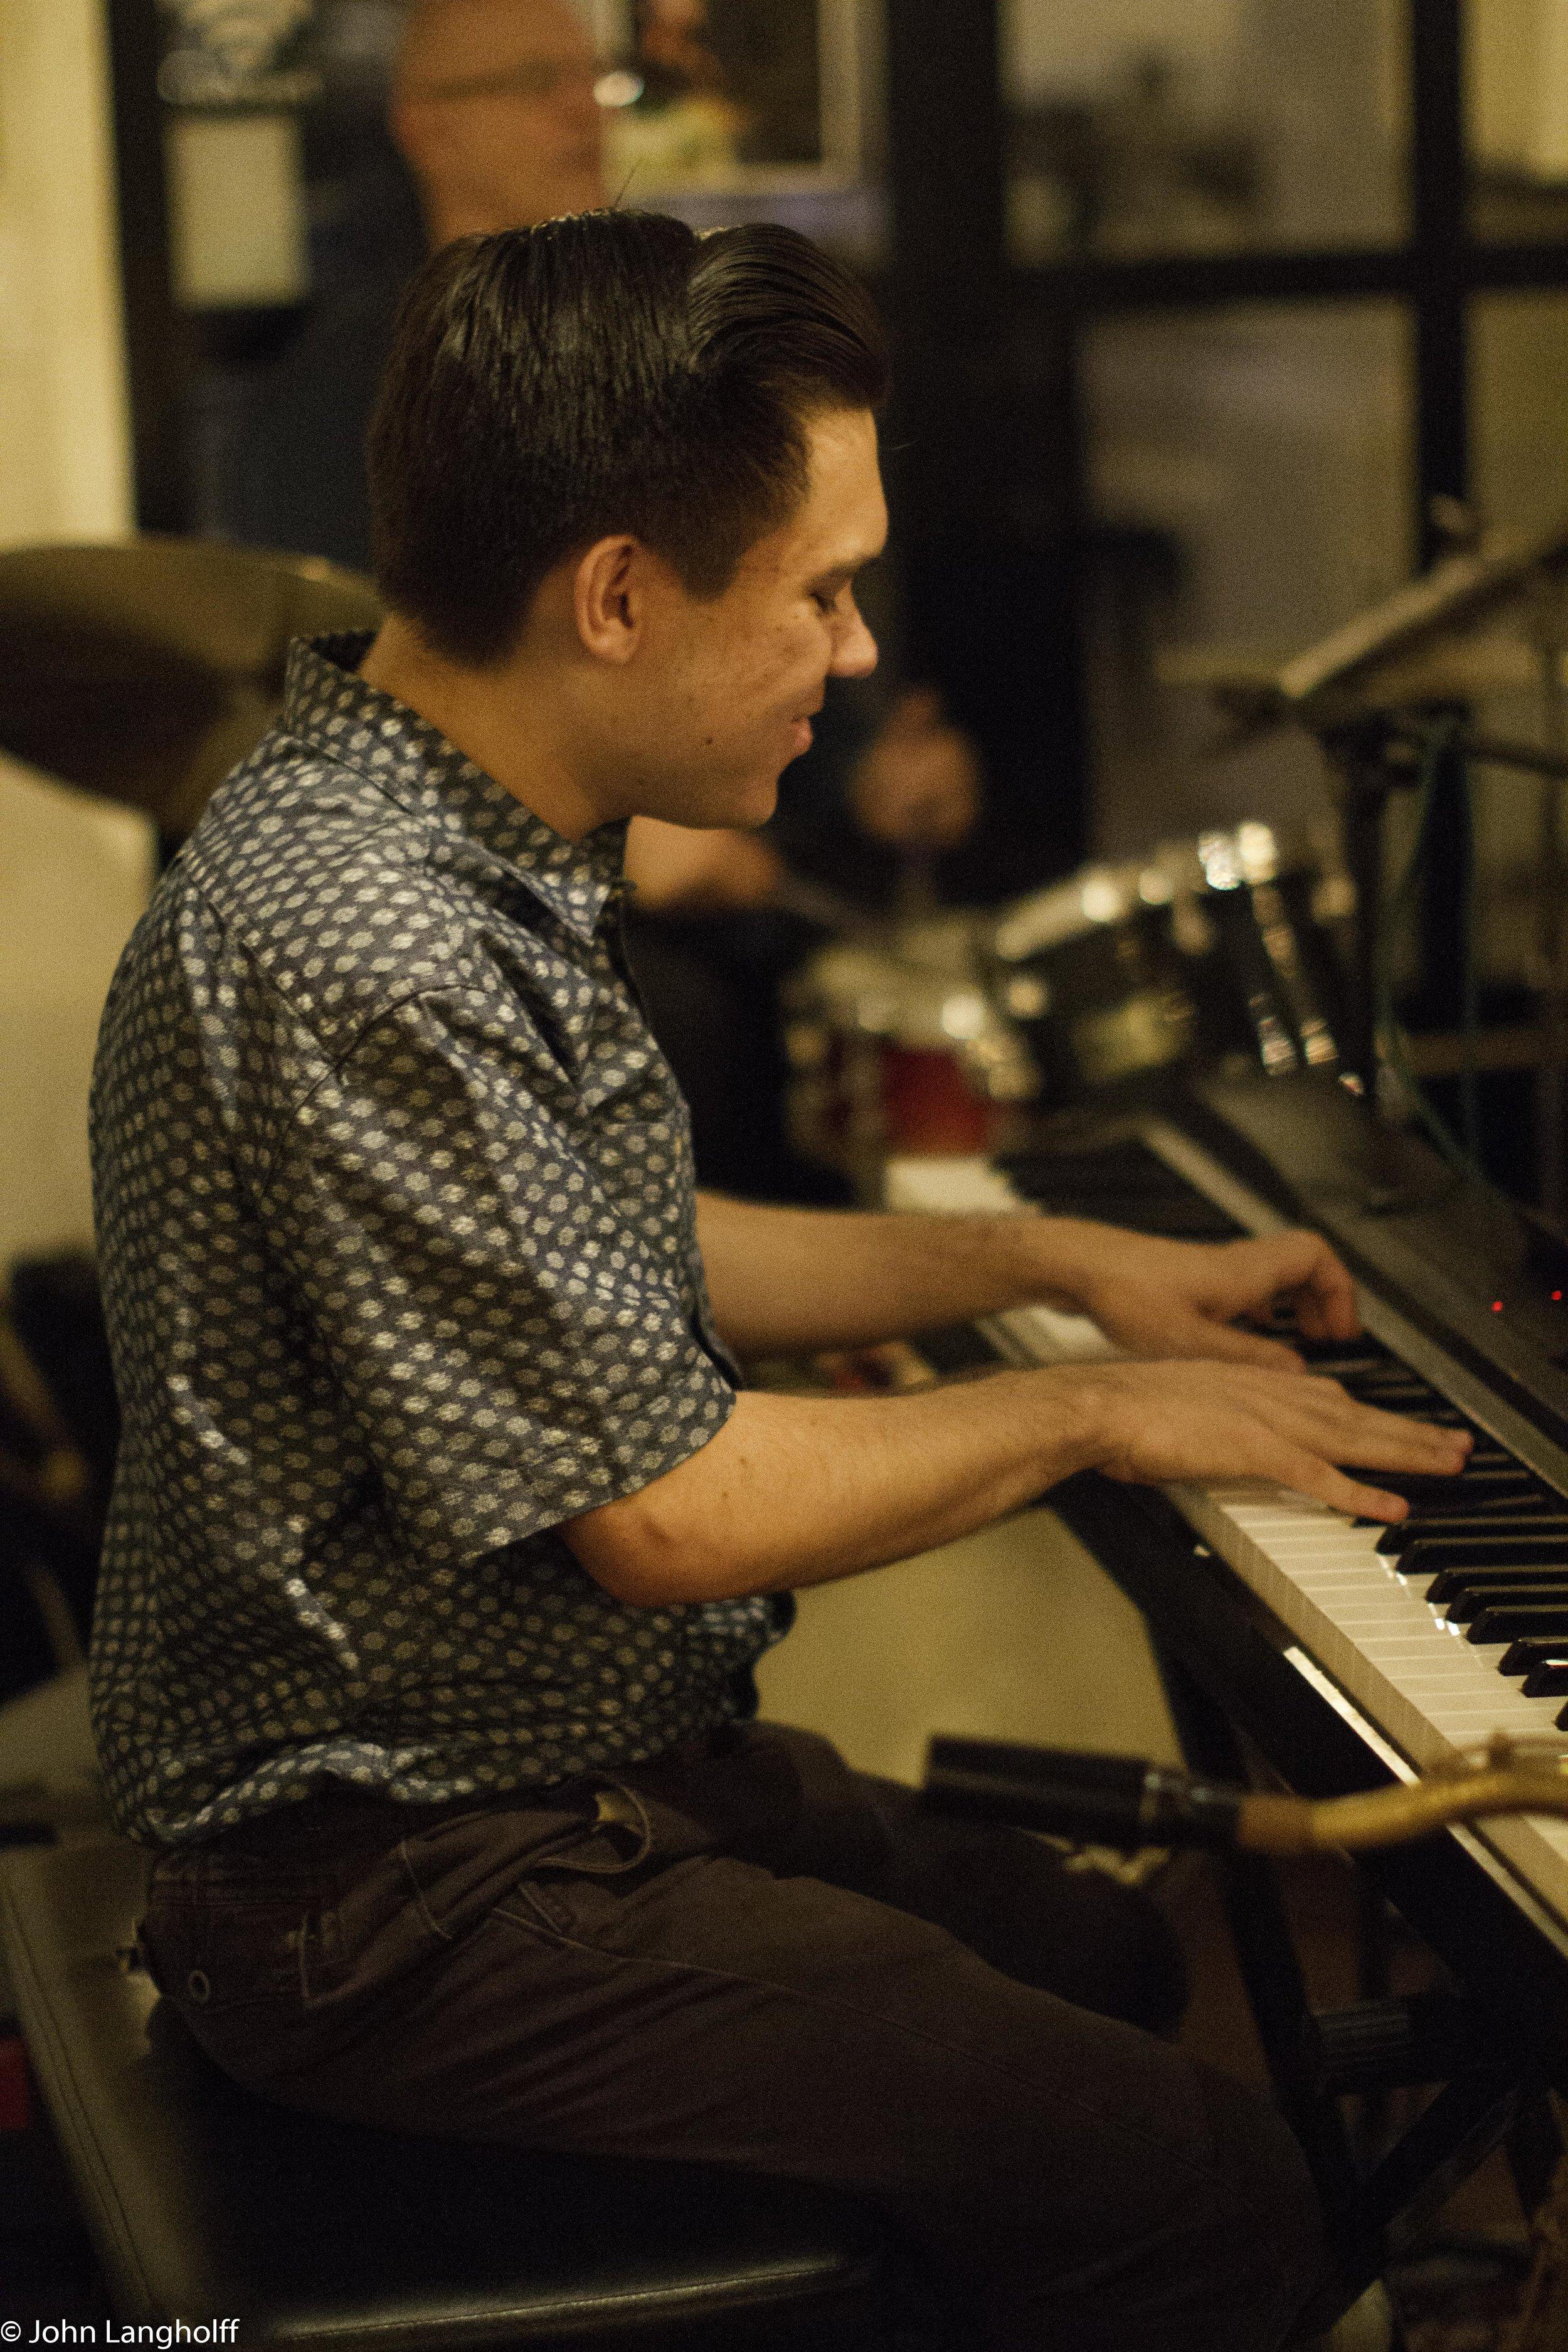 Playin Piano.jpg